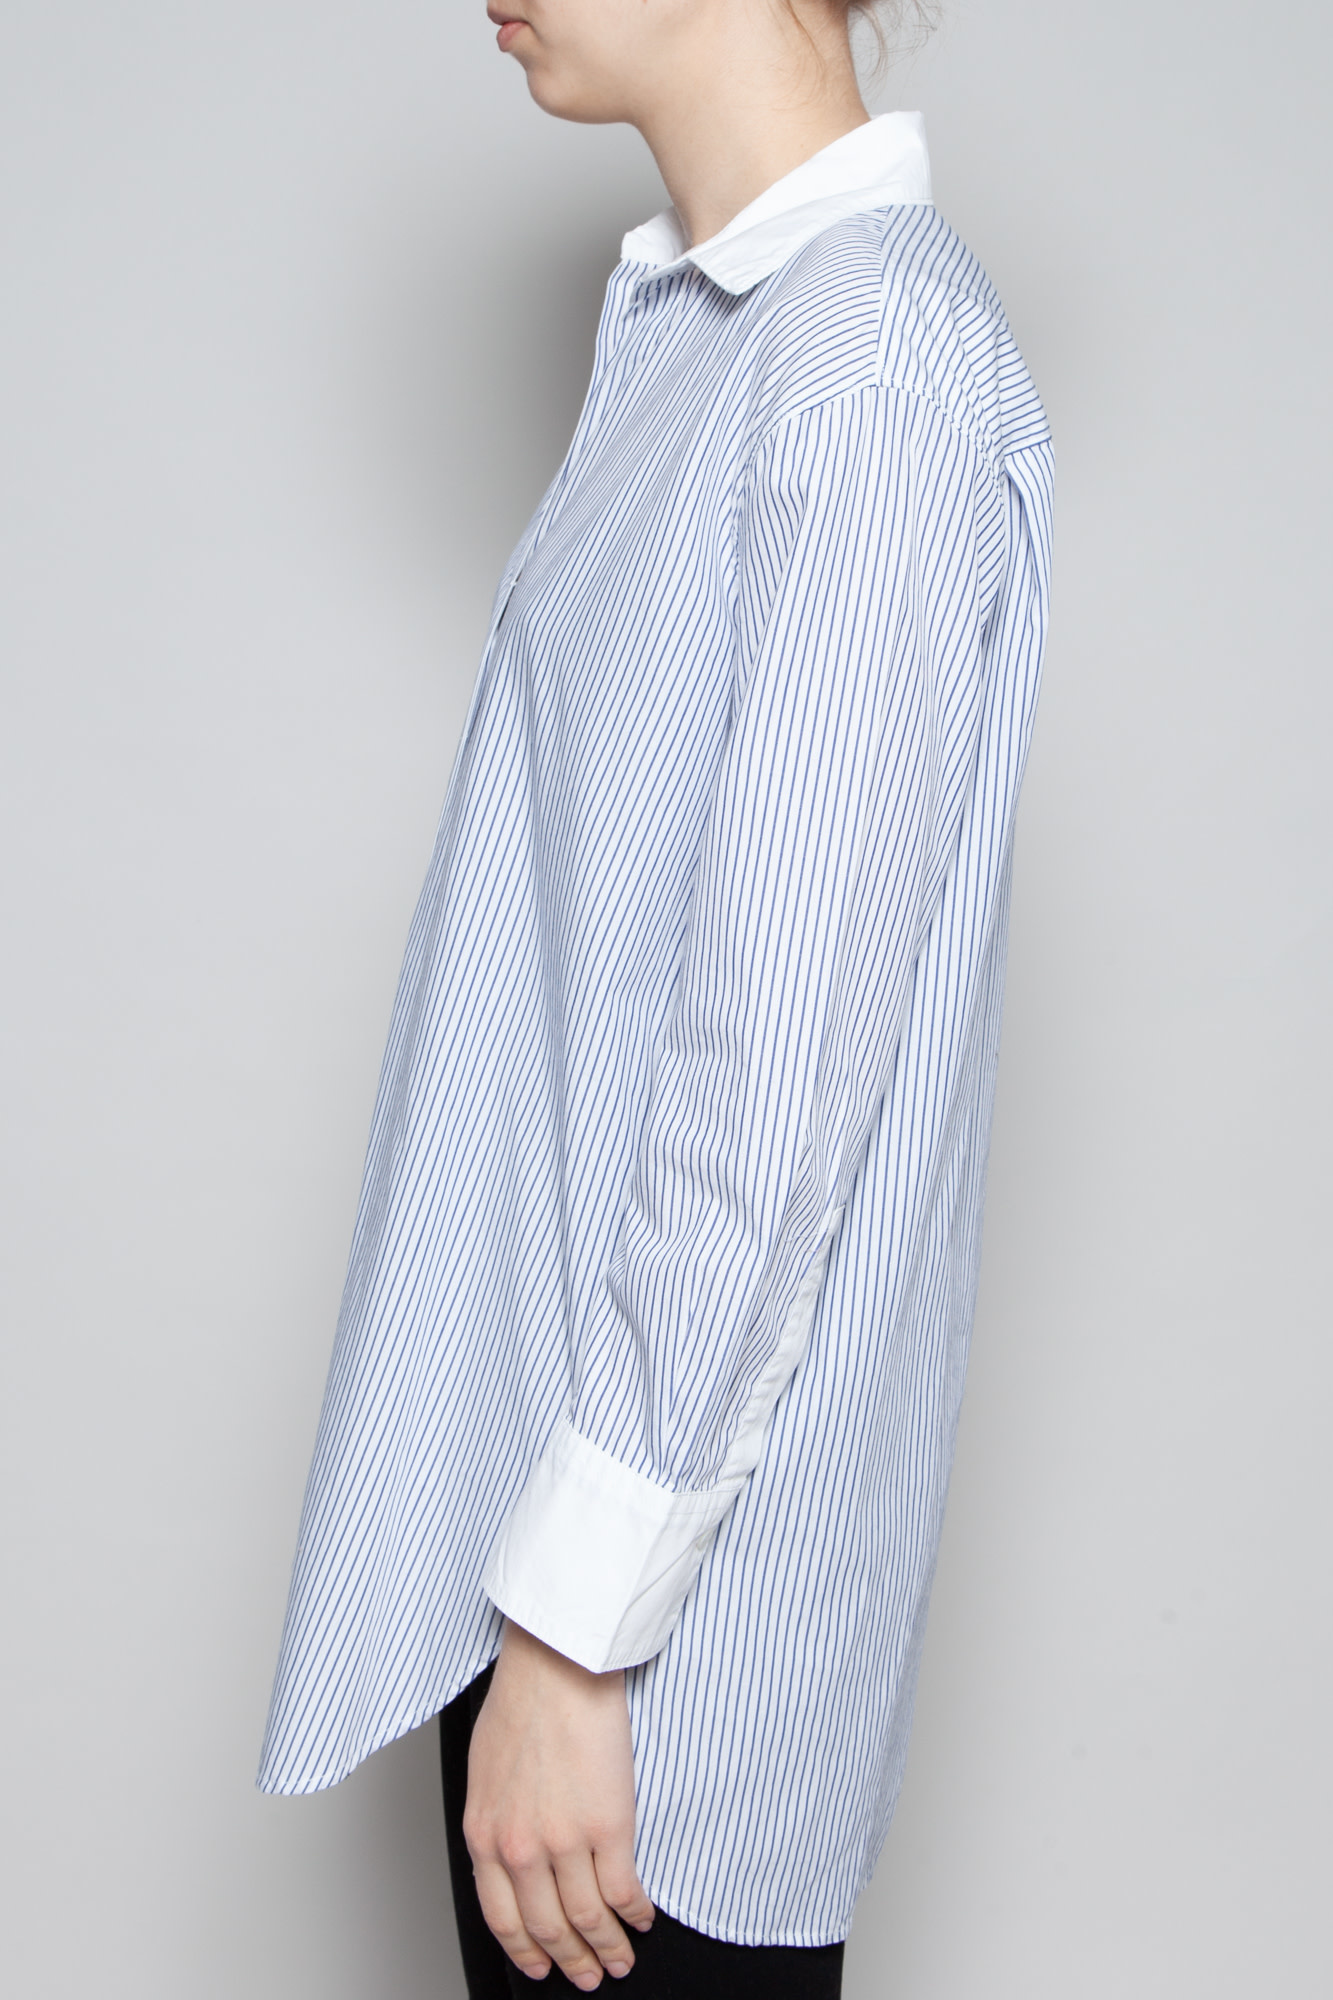 Diega WHITE AND BLUE STRIPED SHIRT